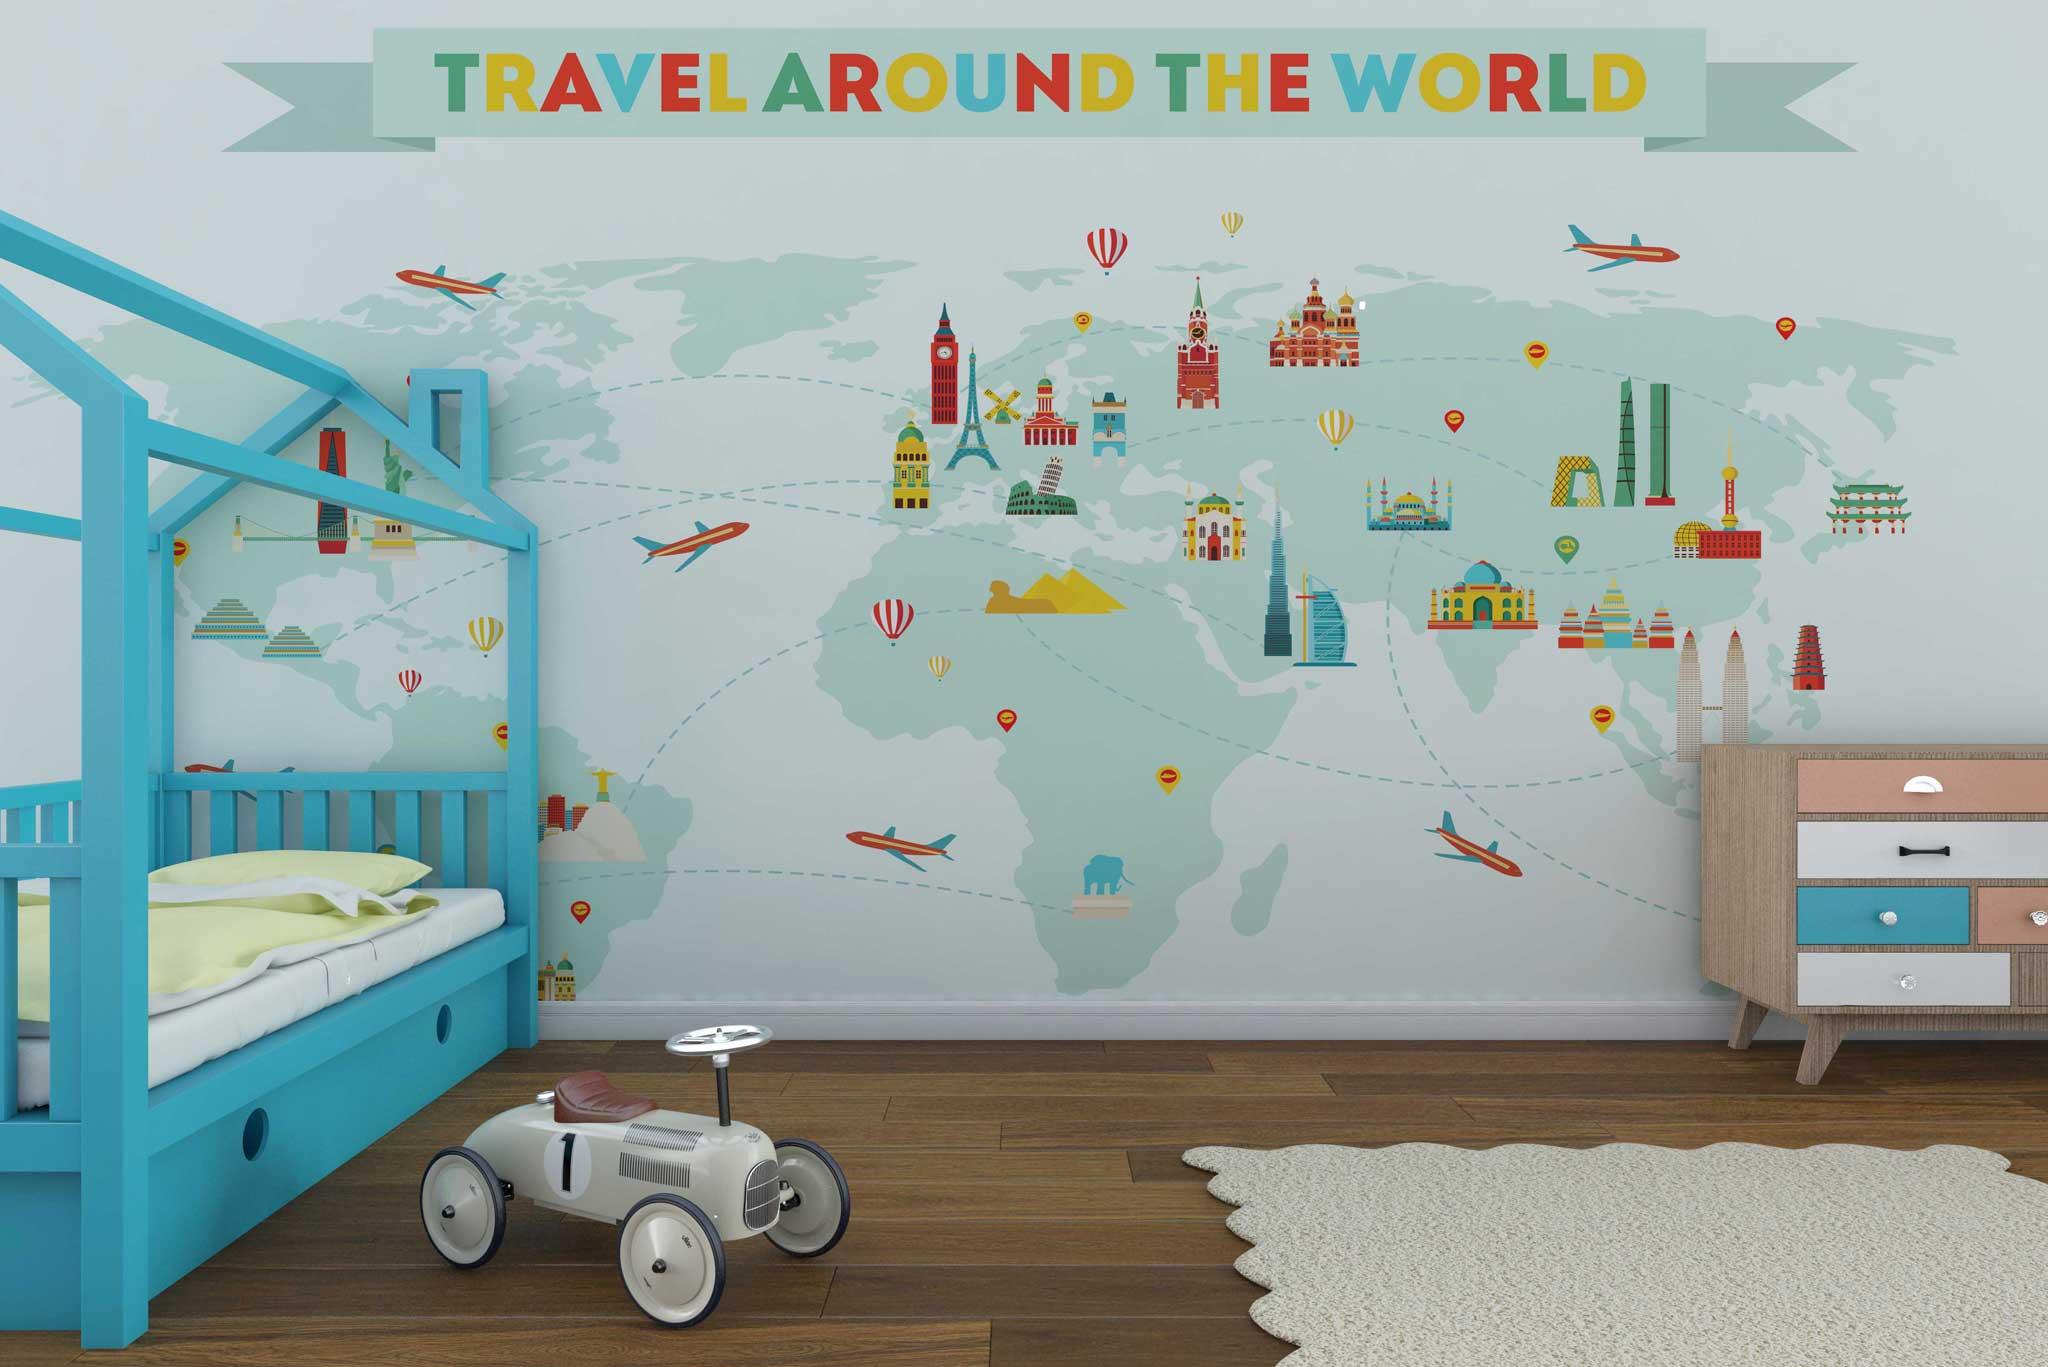 tapet-fototapet-custom-comanda-personalizat-bucuresti-camera-copii-model-harta-lumii-monumente-travel-the-world